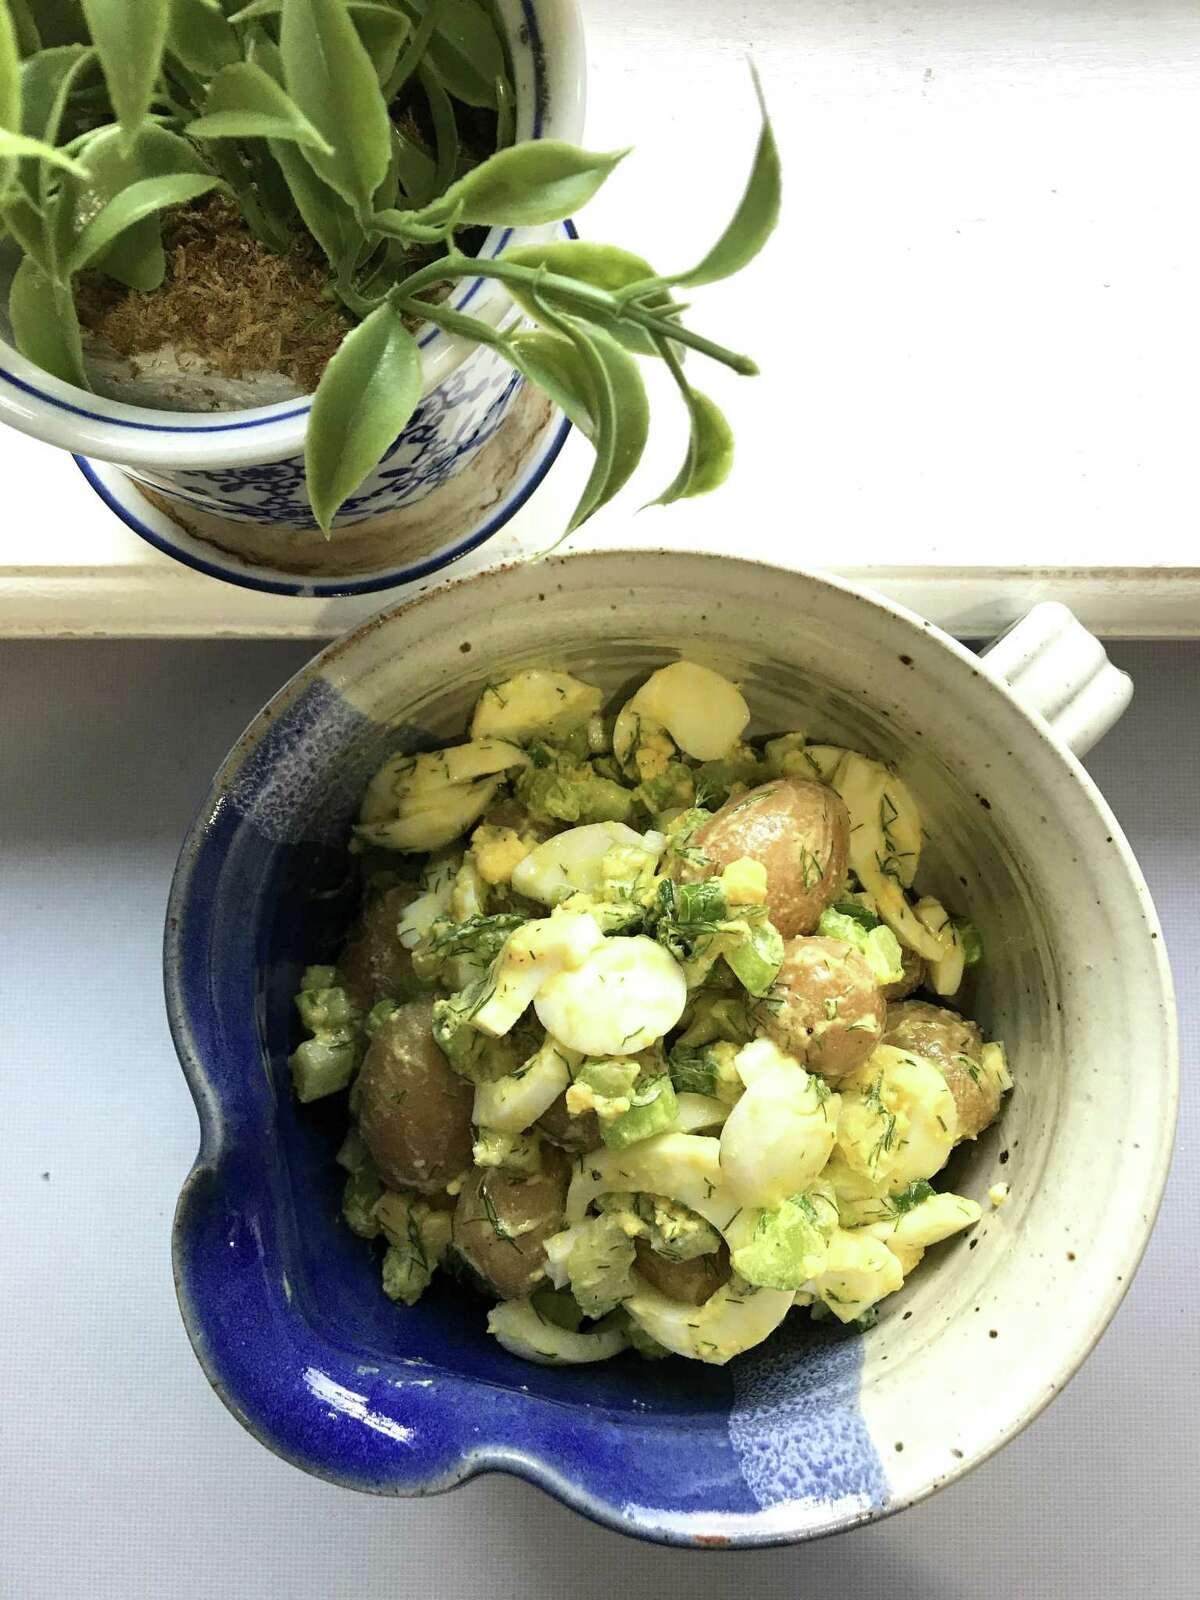 Mustard Vinaigrette Potato Salad with Egg